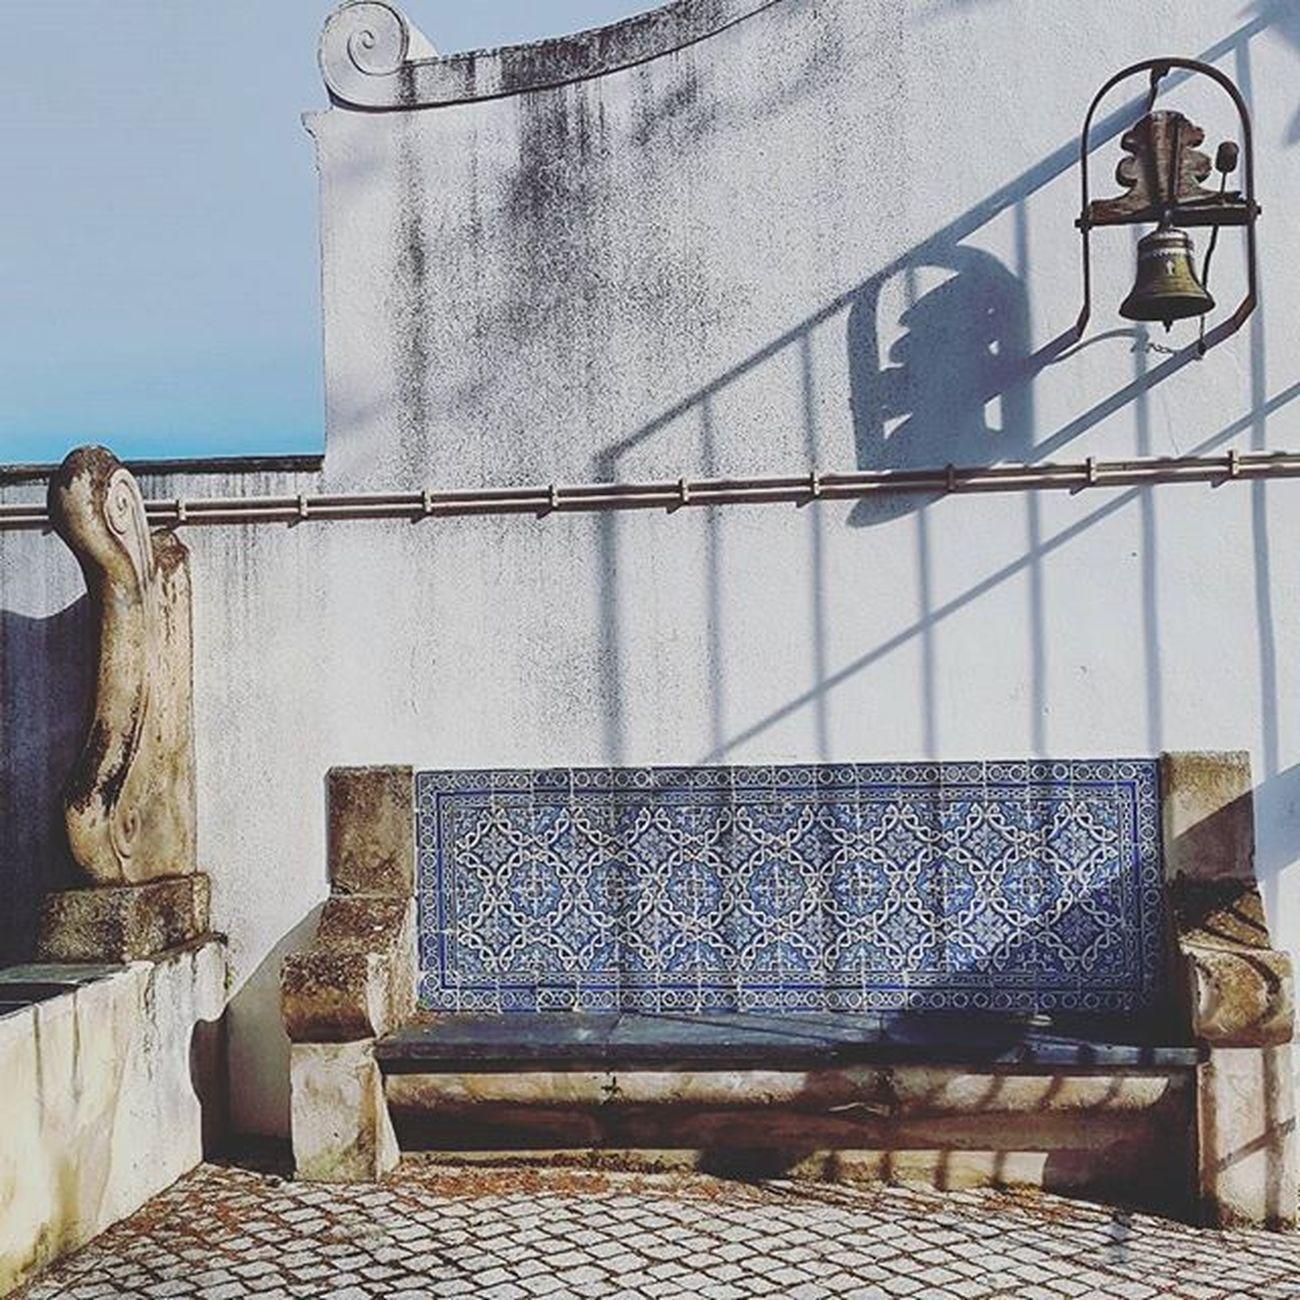 Évora  Instaevora Portugal Architecture Buildings Symmetry Geometry Streetphotography Travelgram Conceptualphotography Photo Faded_world Historic Art Visitevora Followevora Igersportugal Explore Travelling Tourism Visitportugal Travelbloggers Beautifuldestinations Citybreak Worldheritage monochrome monocromatico unescoworldheritage portugalnorteasul